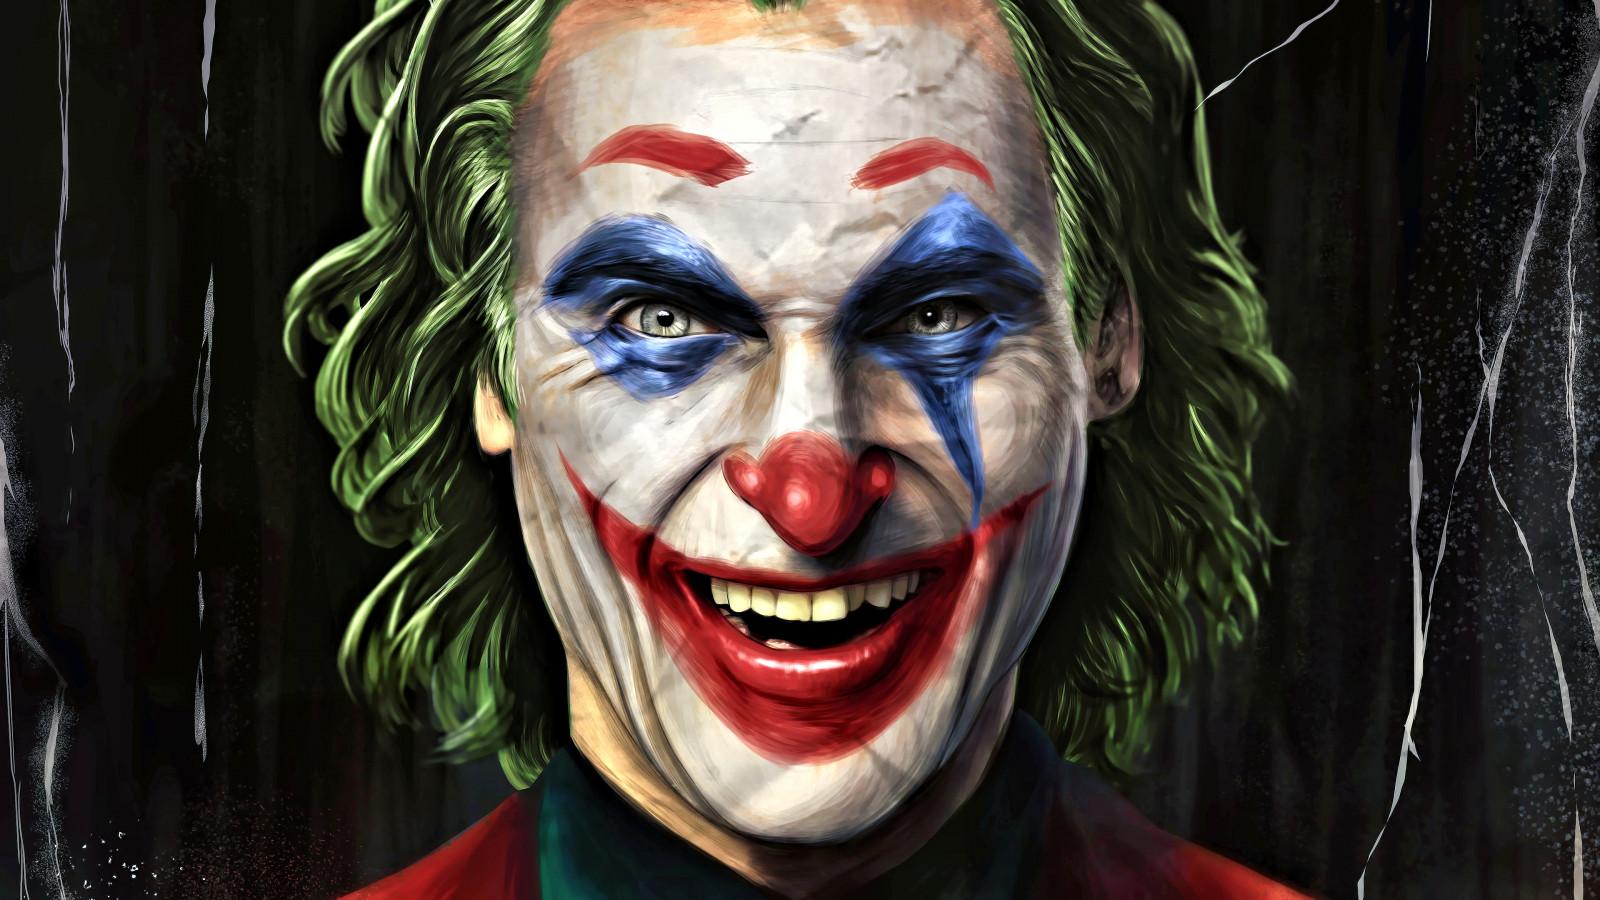 Wallpaper Joker 2019 Movie Gotham City Paint Brushes Dc